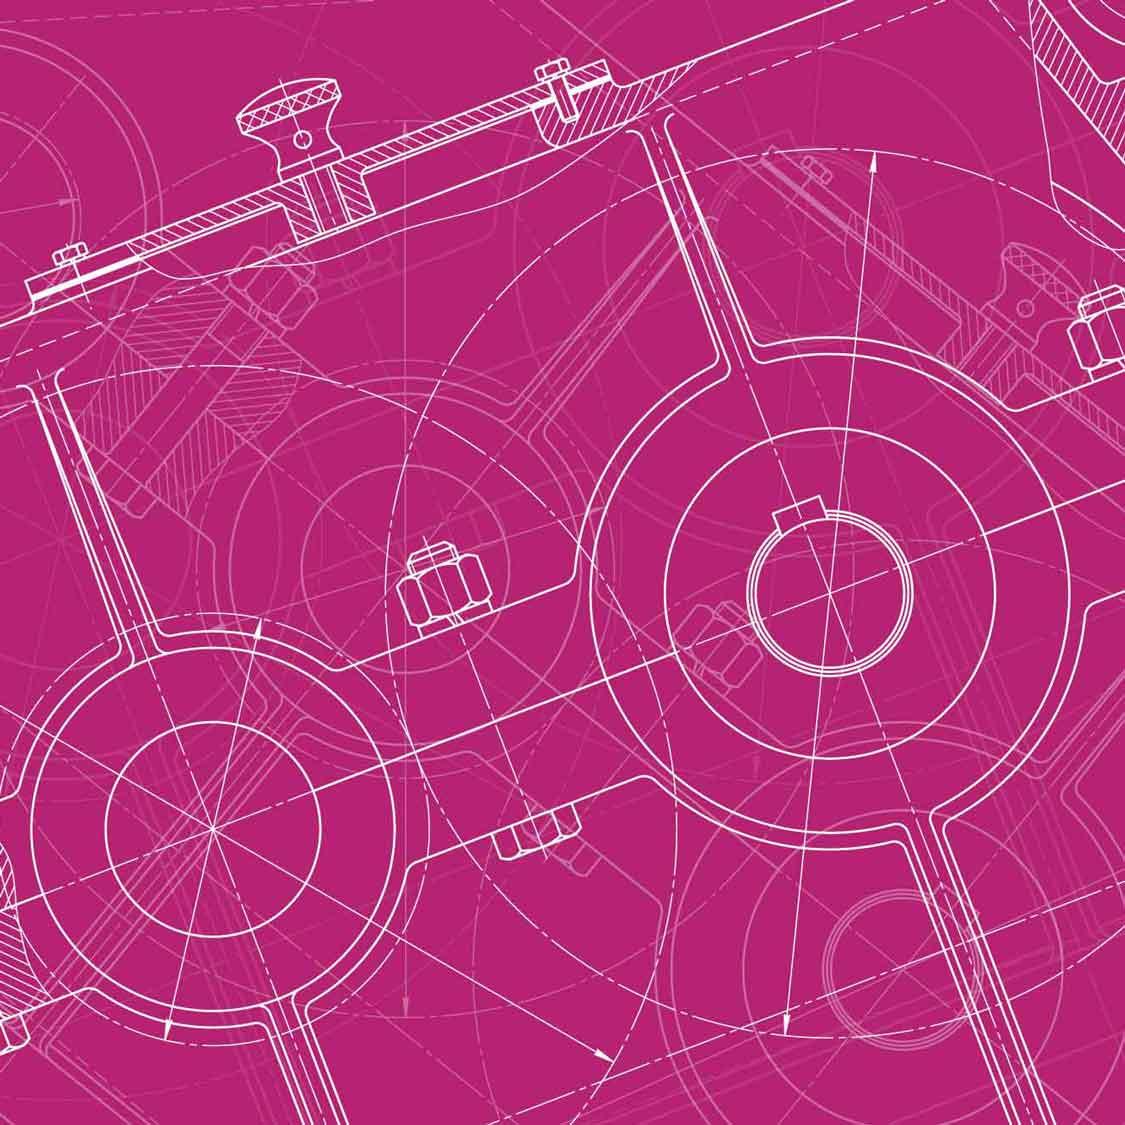 avionics manufacturers frequencia drawing